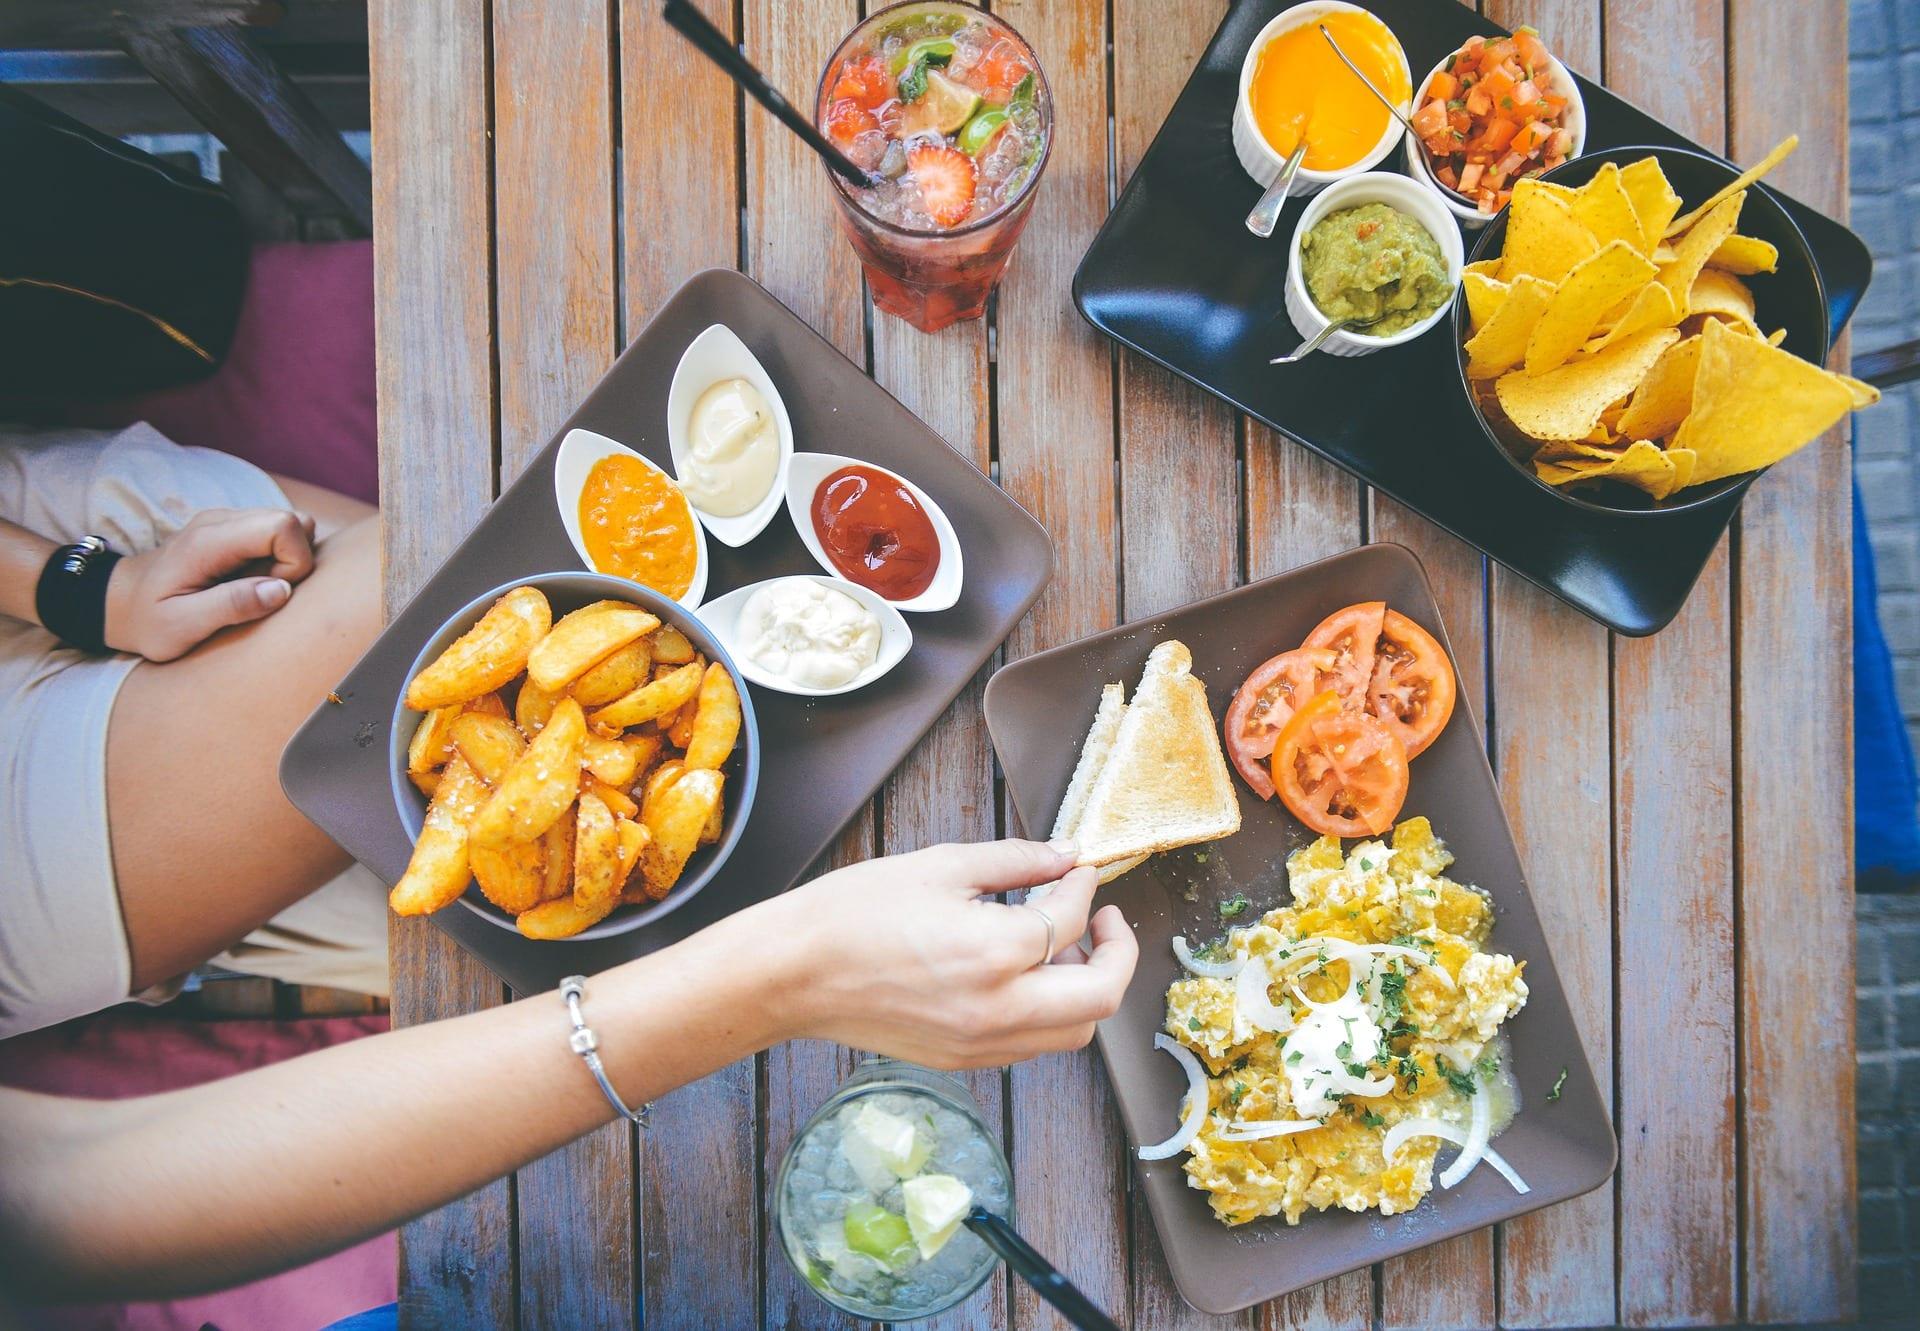 Best Restaurant Review Websites in India